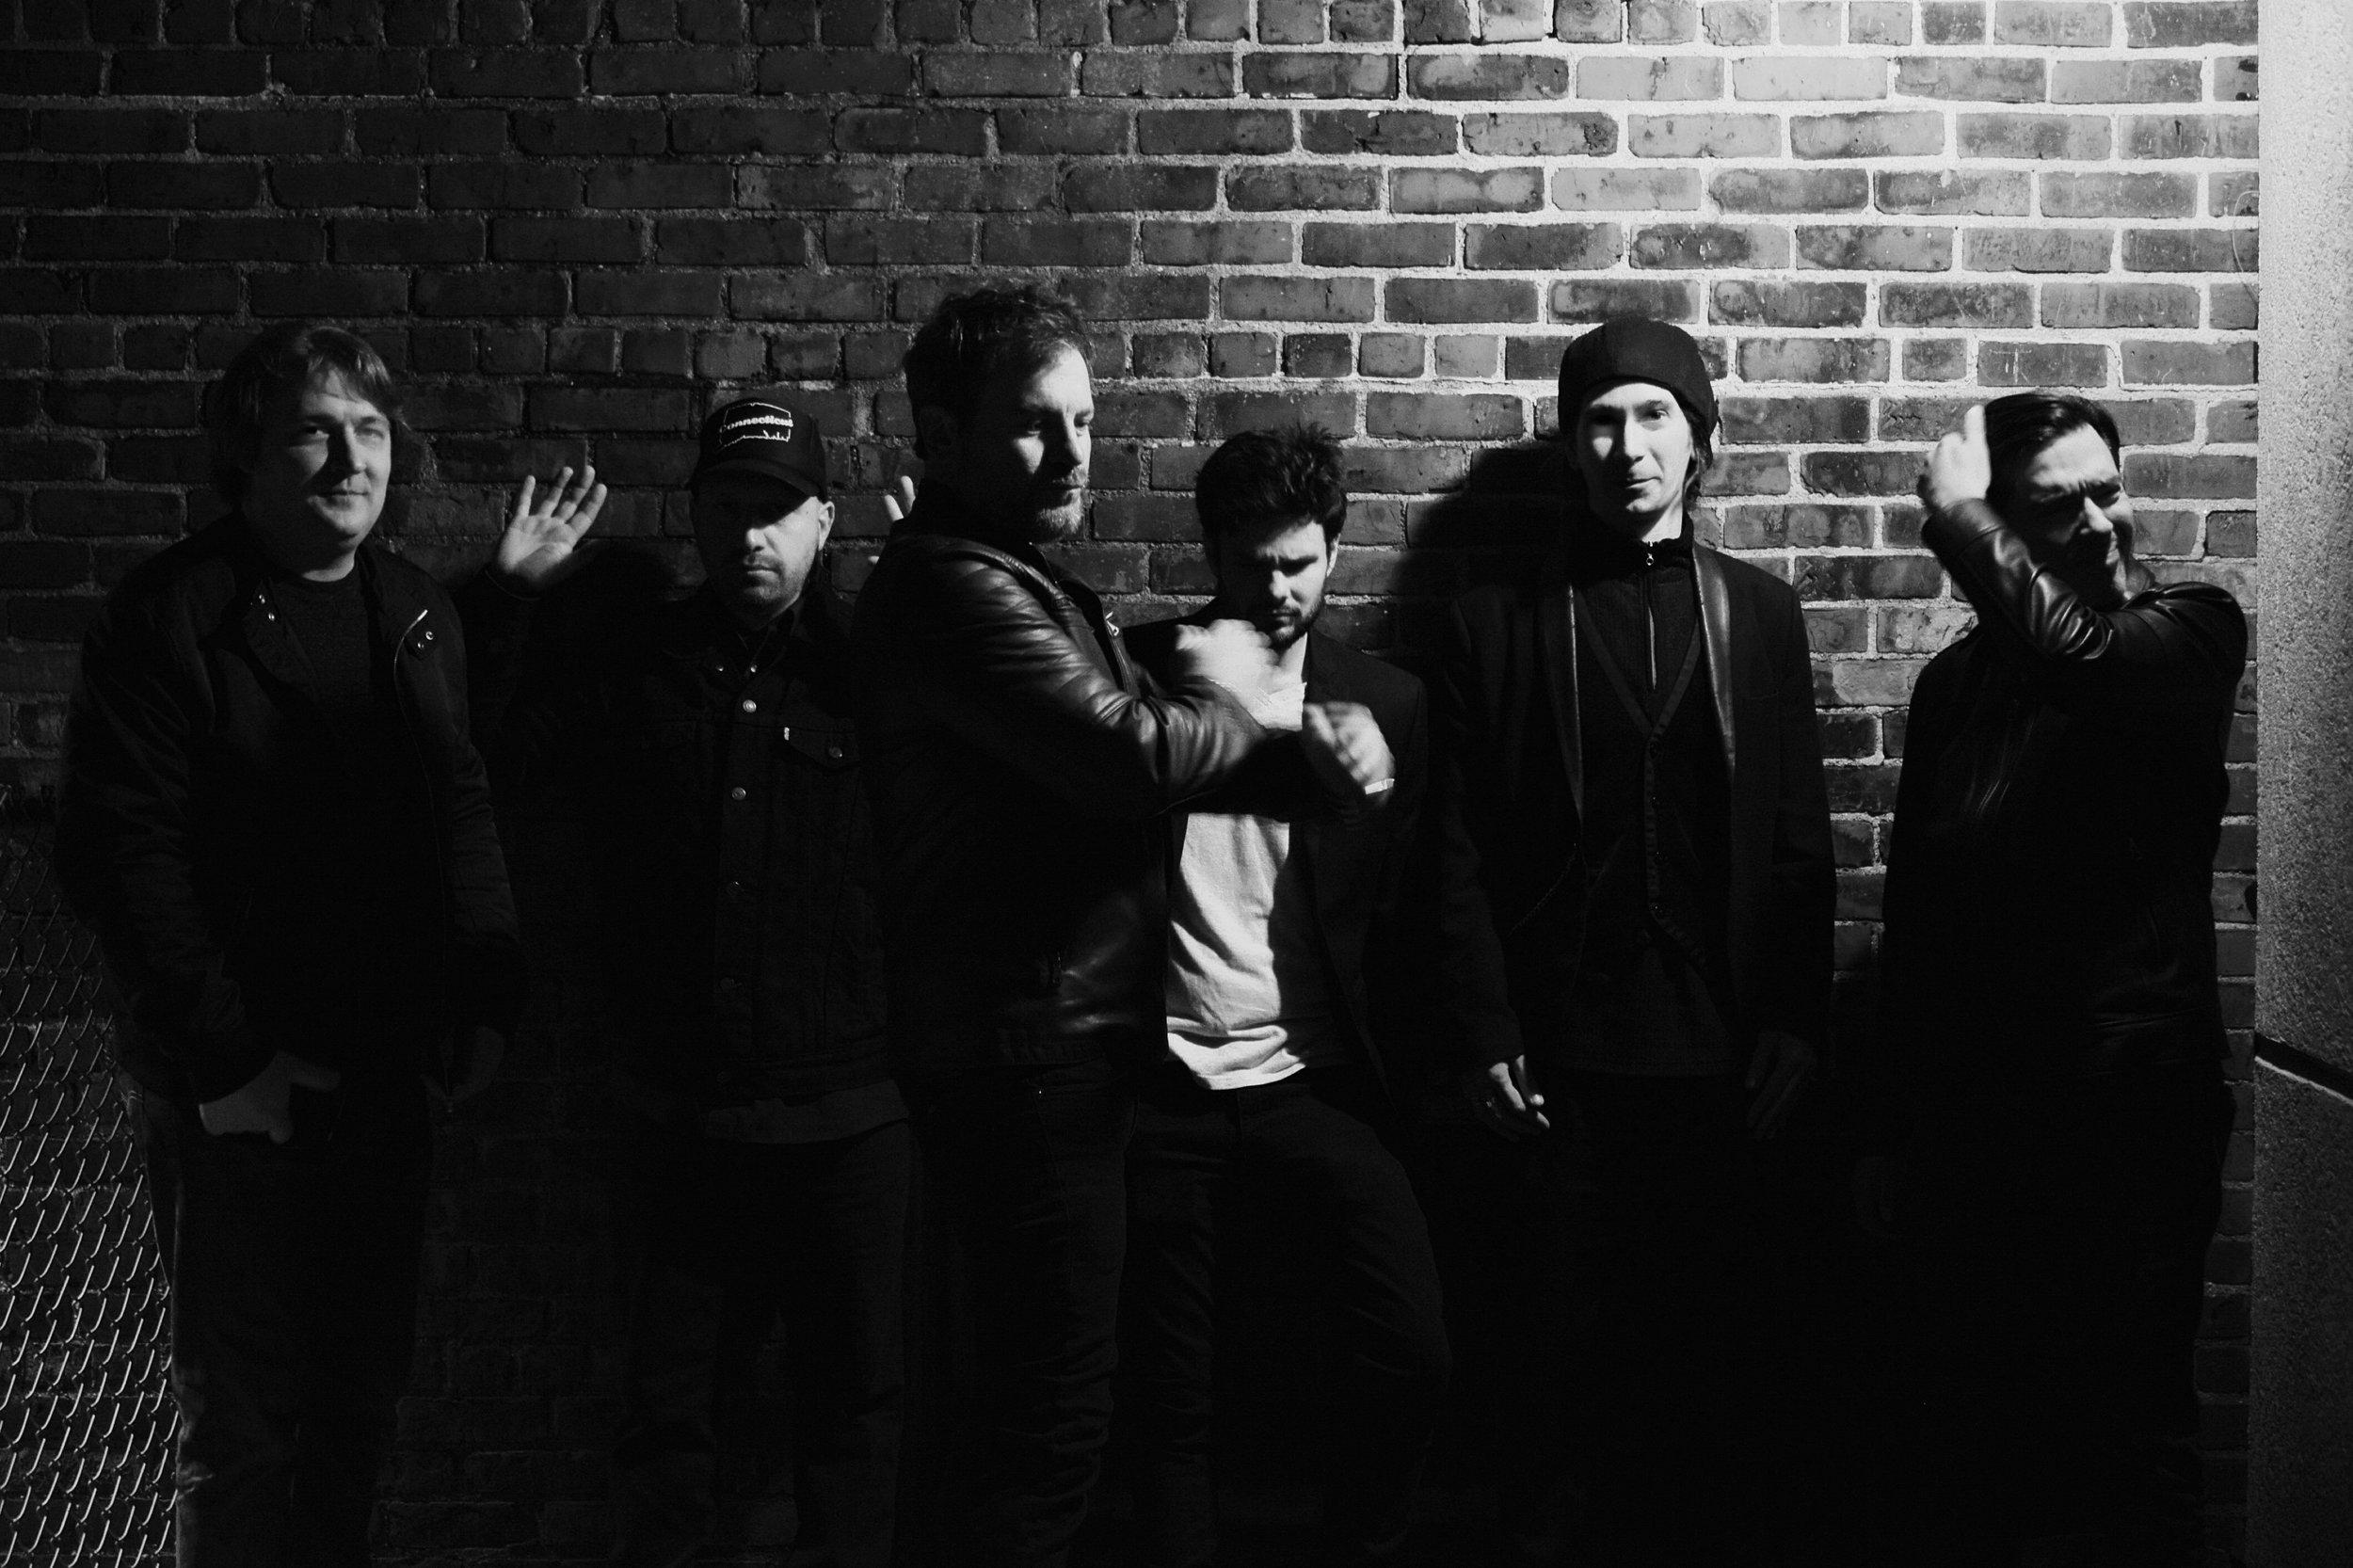 L-R: Jason Banta, J Curland, Bobby Crash, Max Kelly, Matt Gouette, Pete Barrera